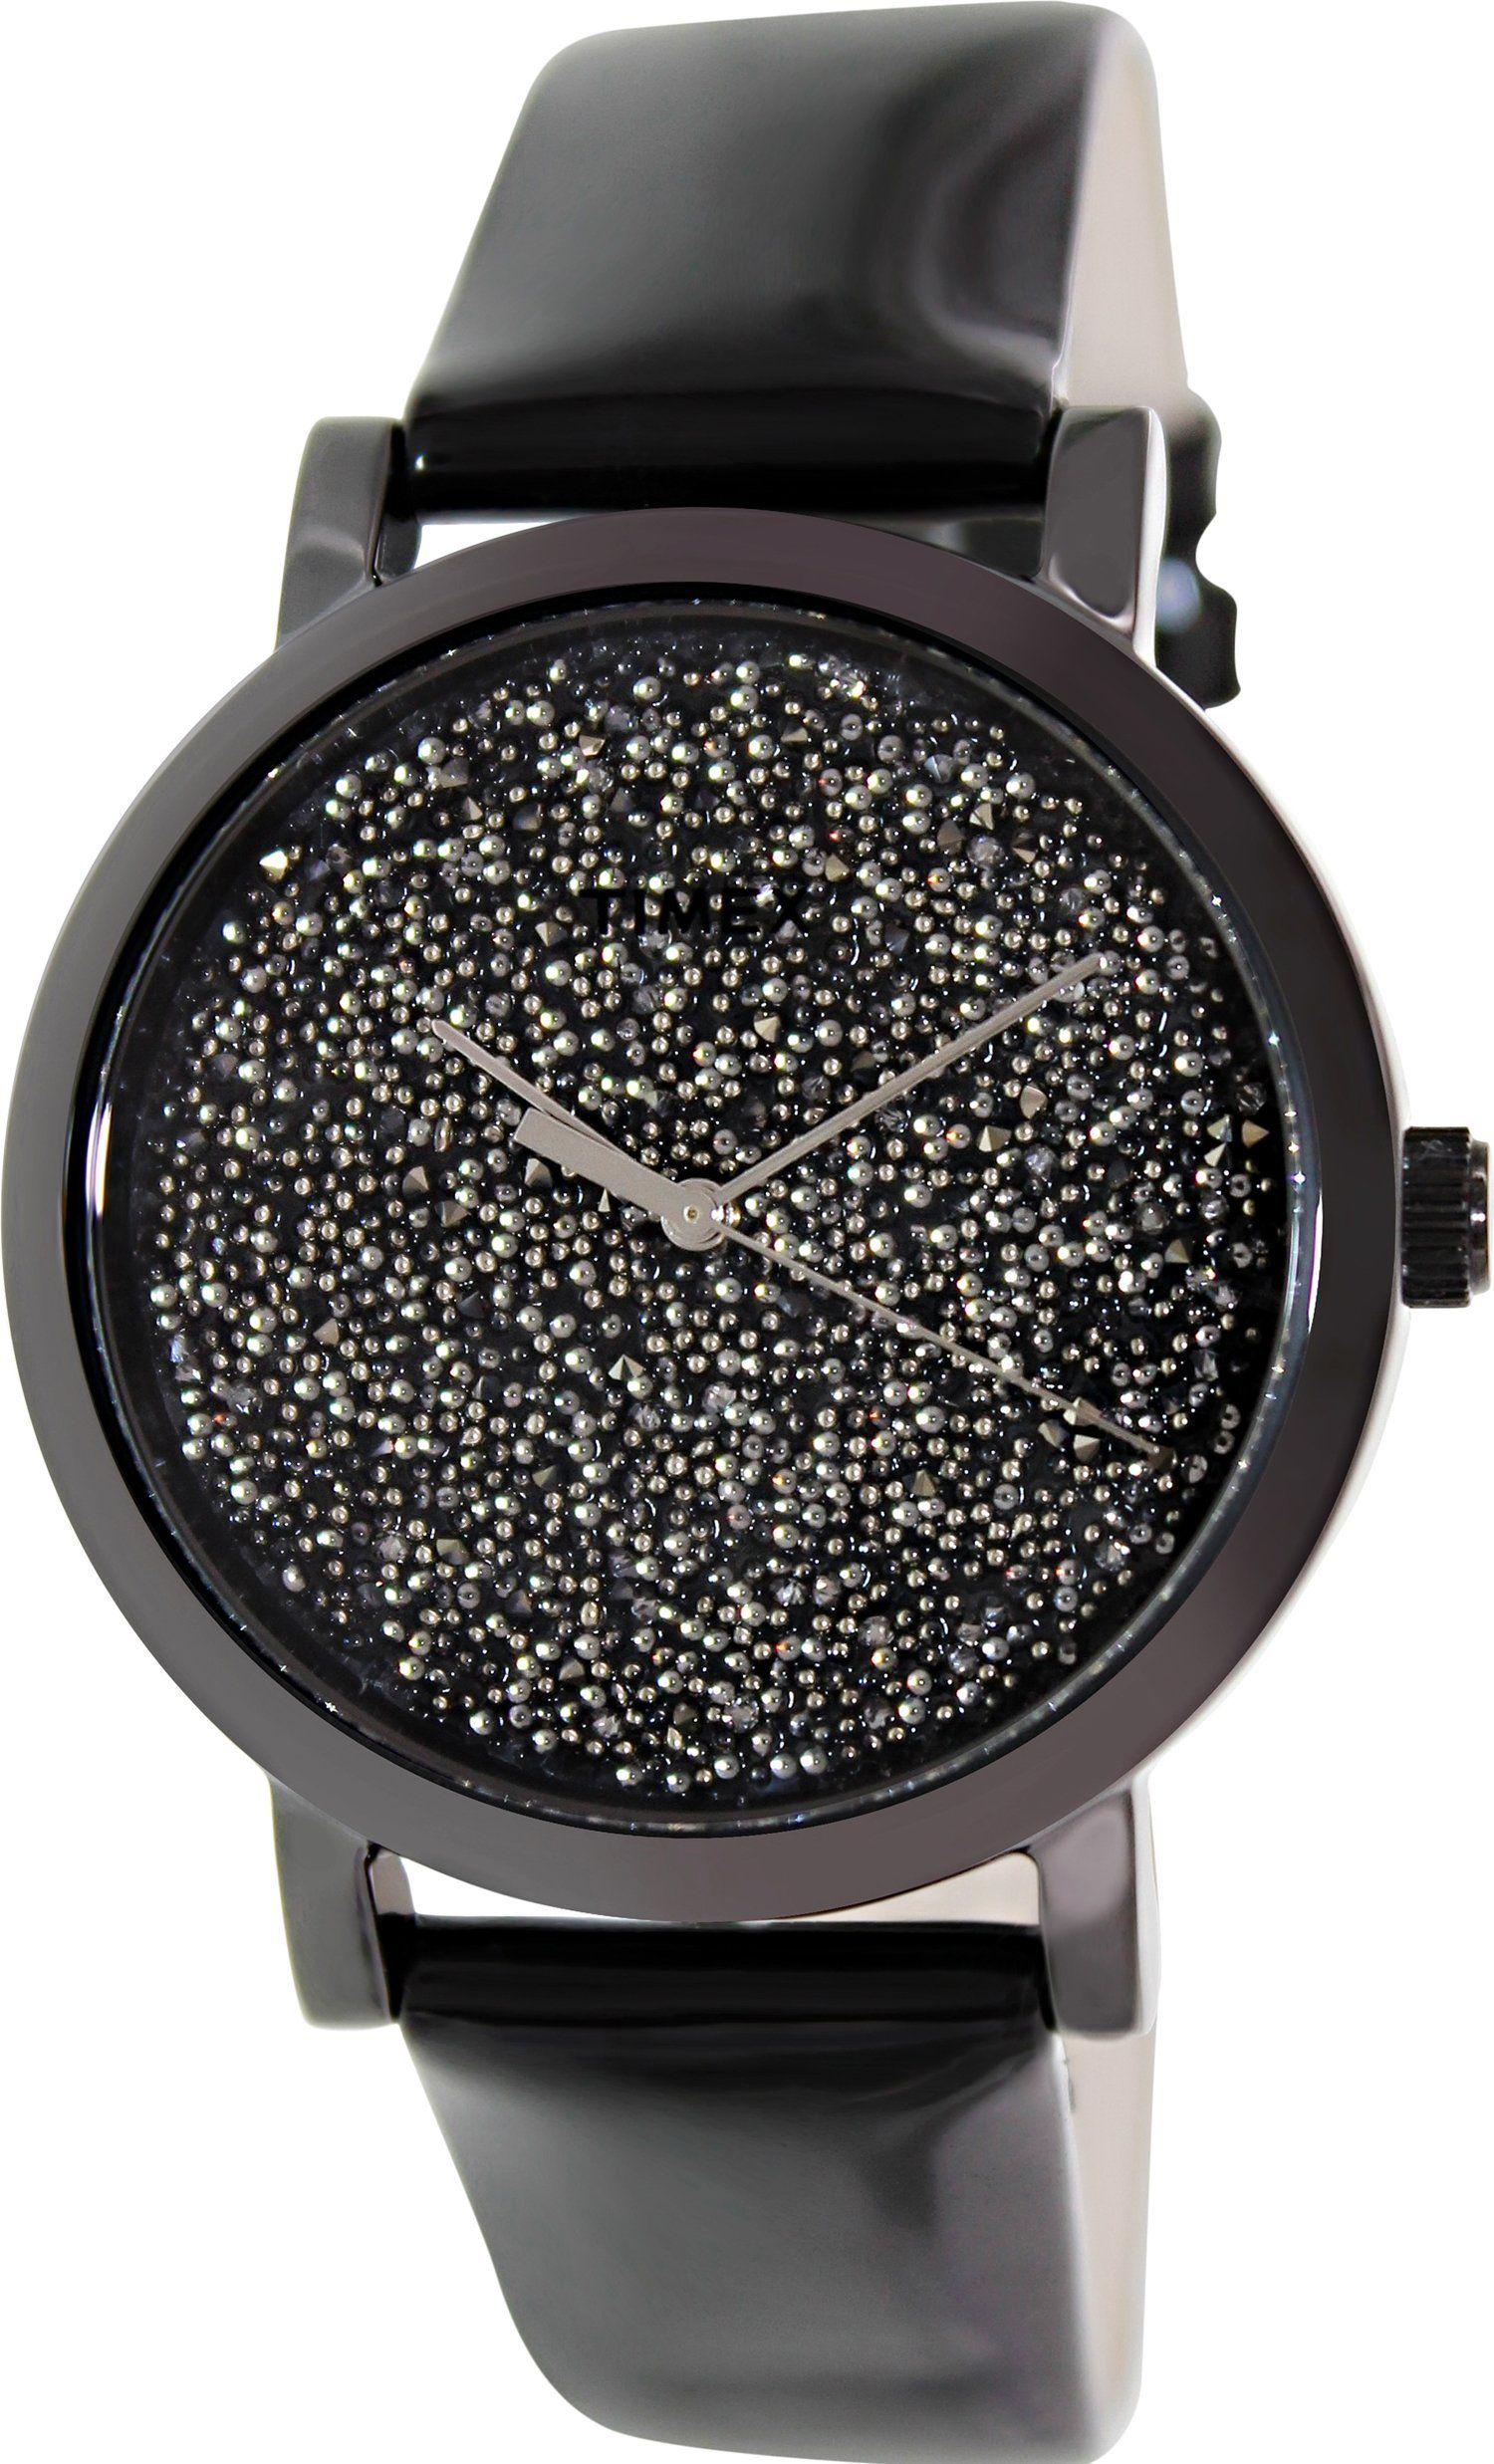 Timex Women's Originals T2P280 Black Leather Analog Quartz Watch with Black Dial